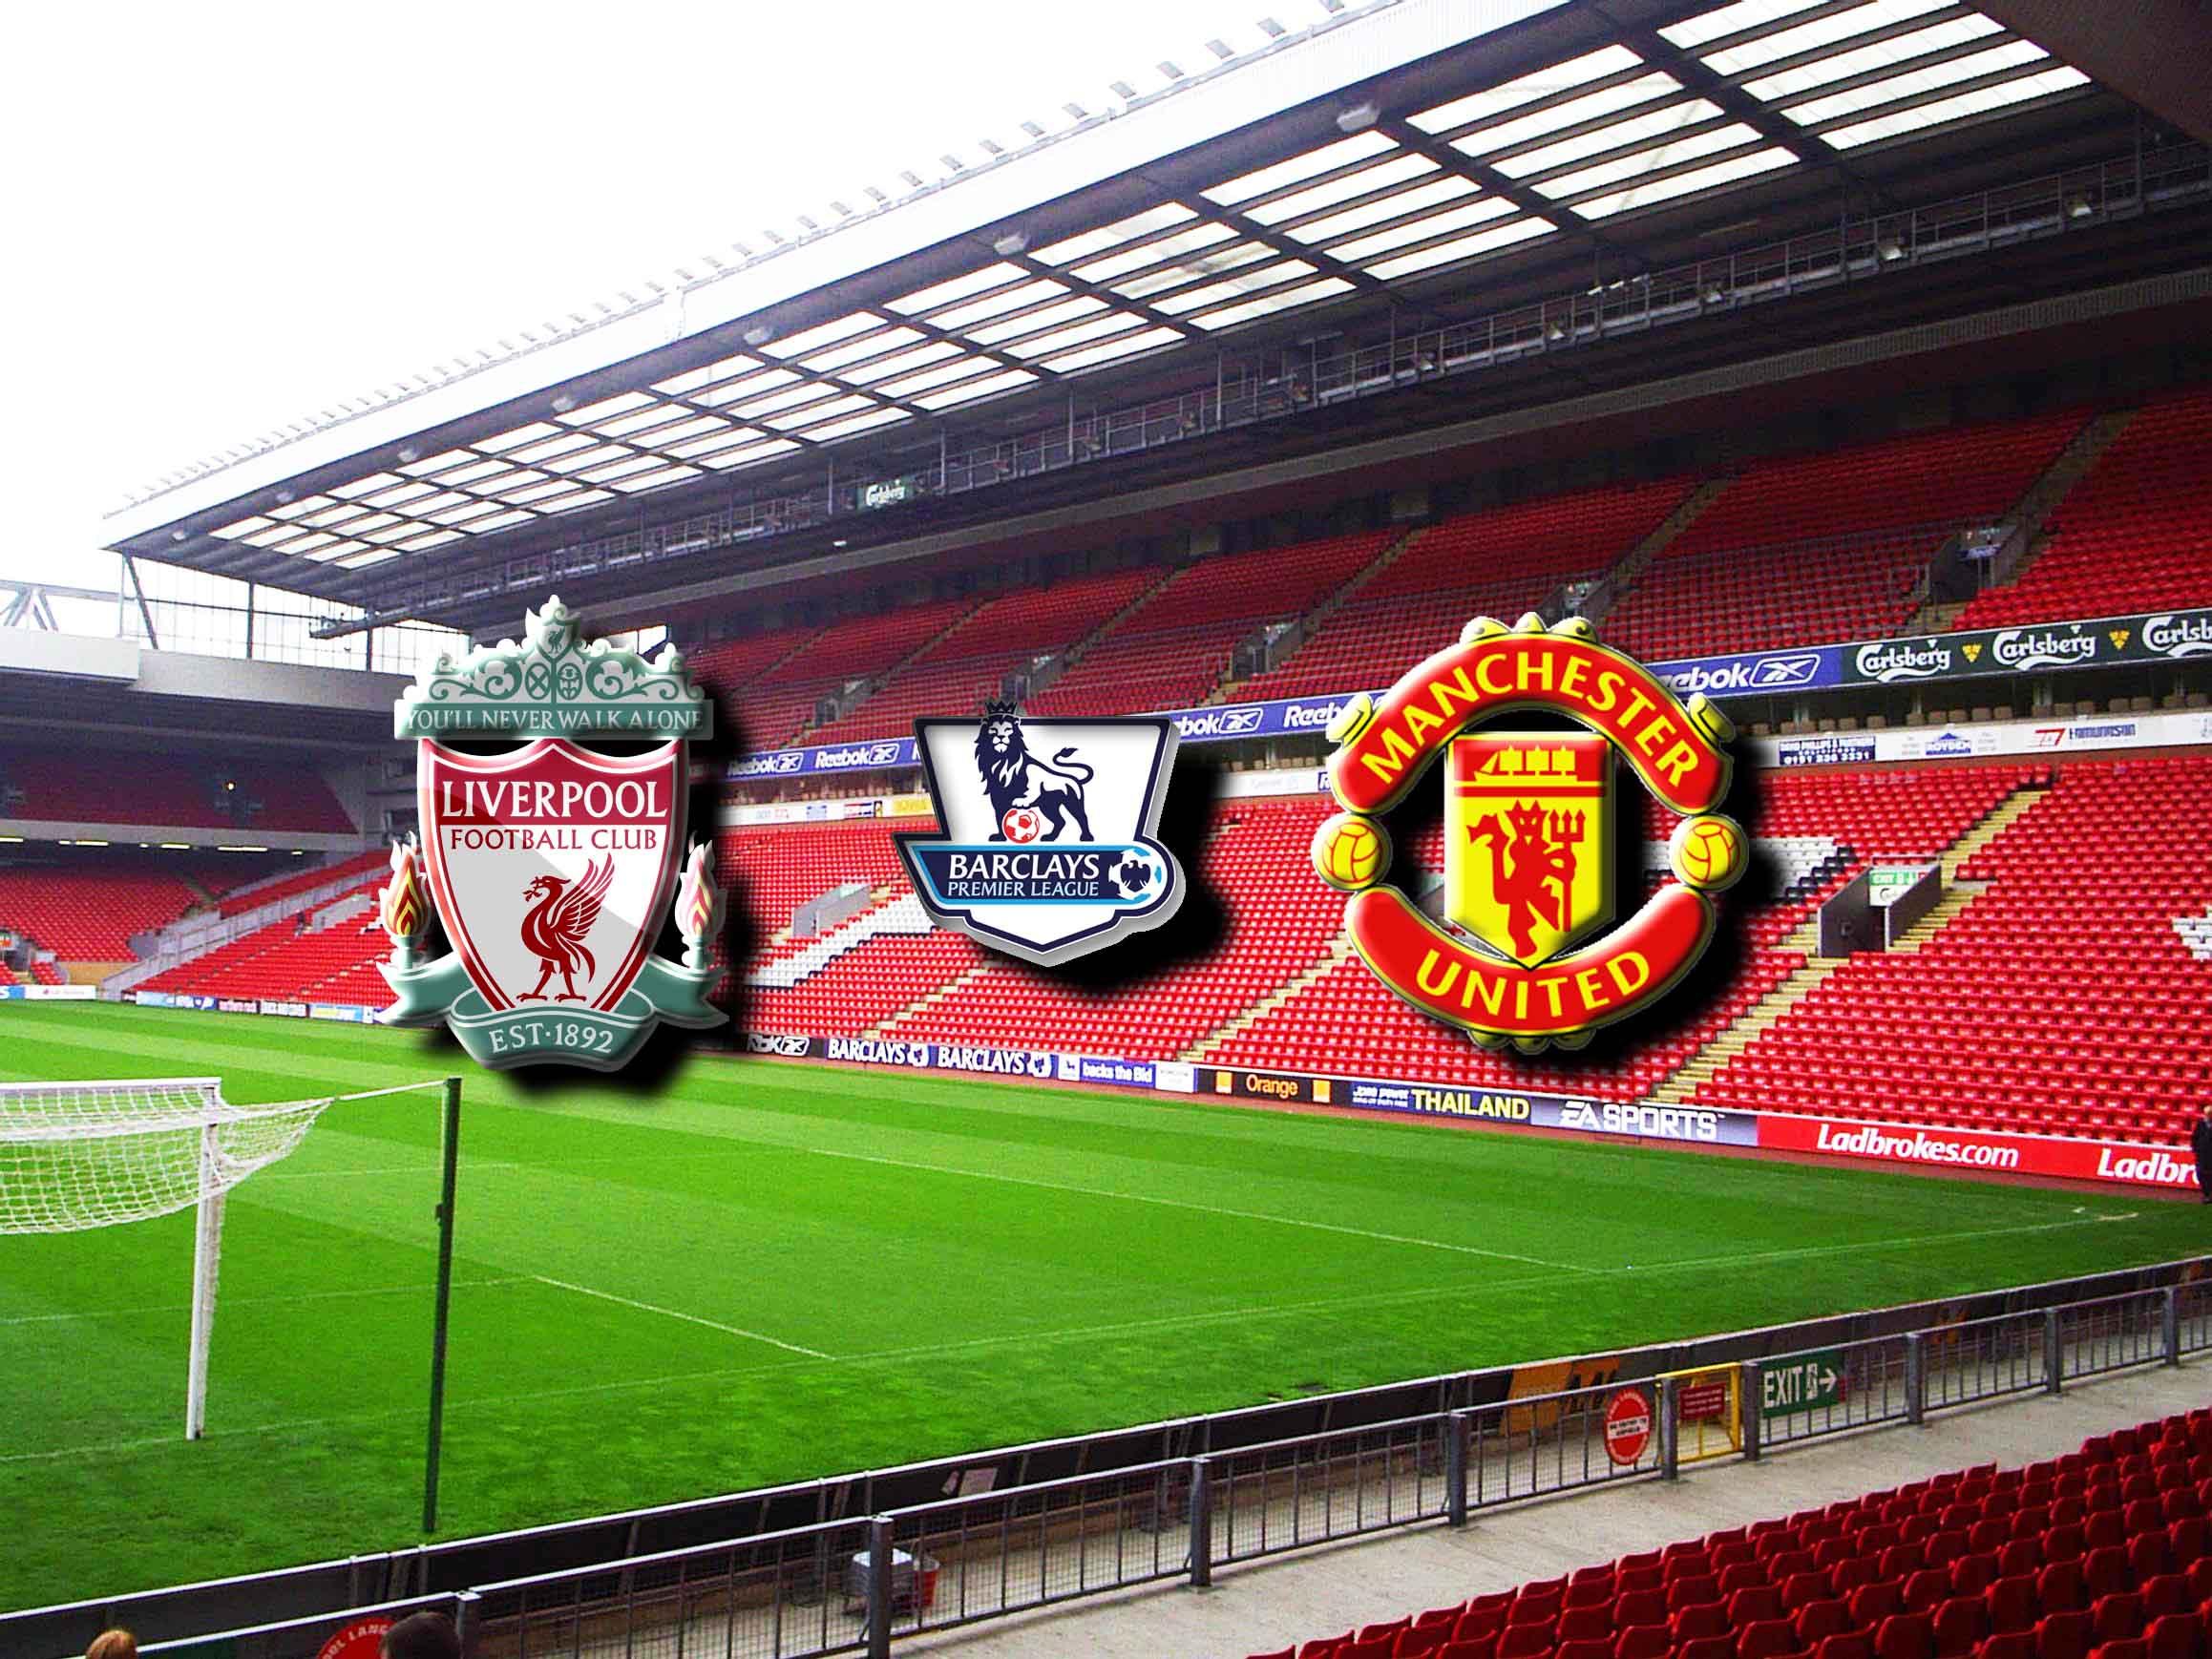 Прогноз на матч Ливерпуль - Манчестер Юнайтед 17 января 2016